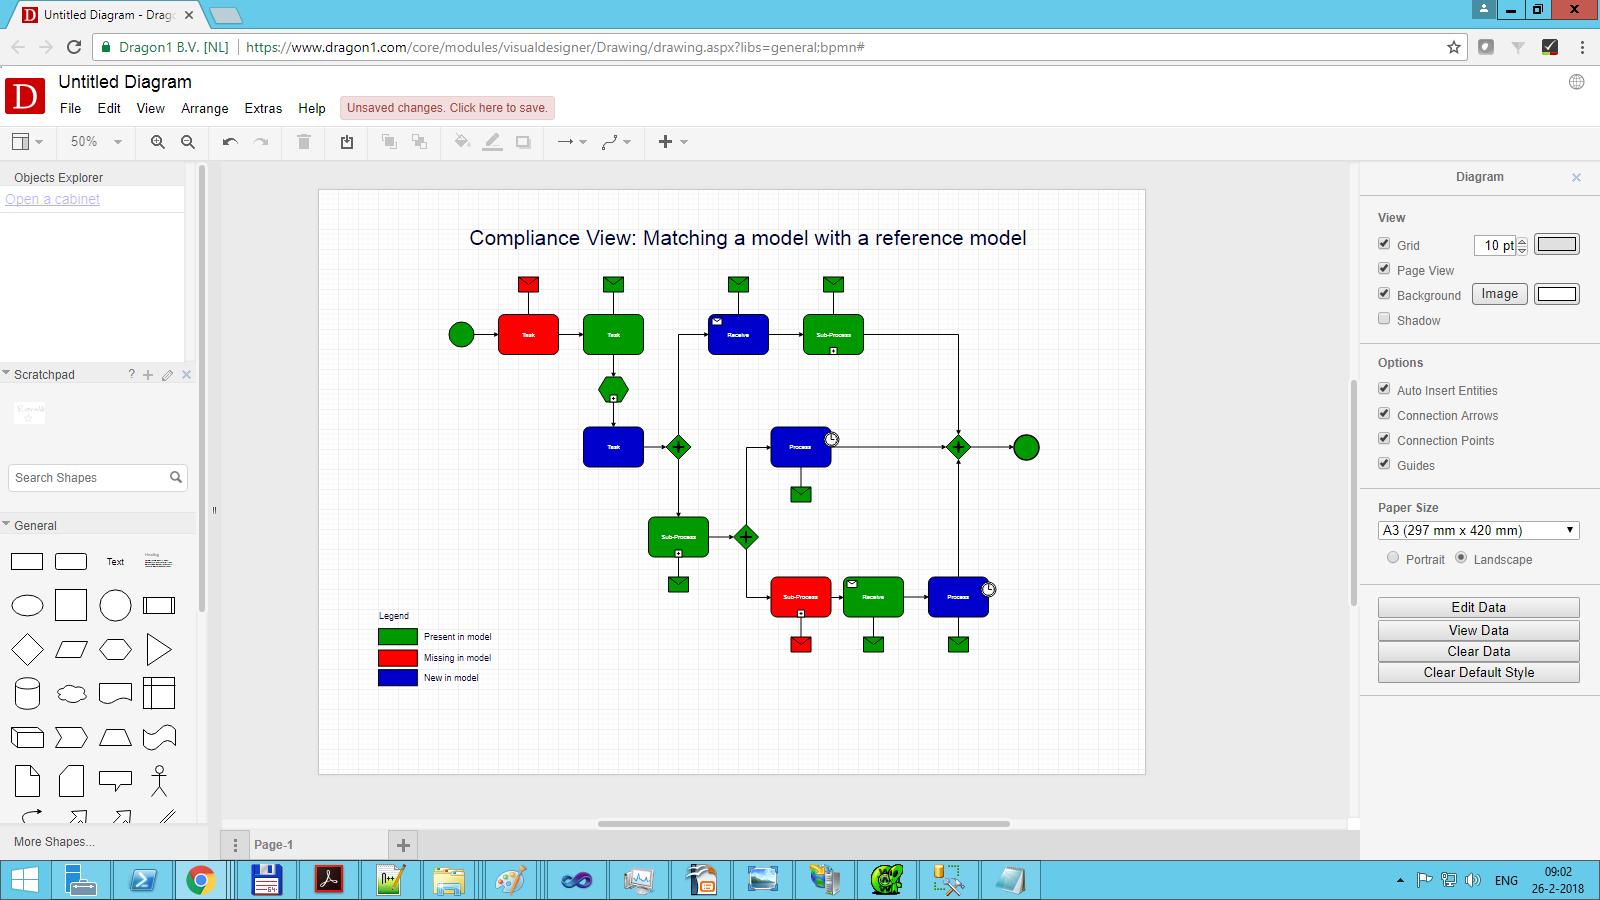 dragon1 compliance data view